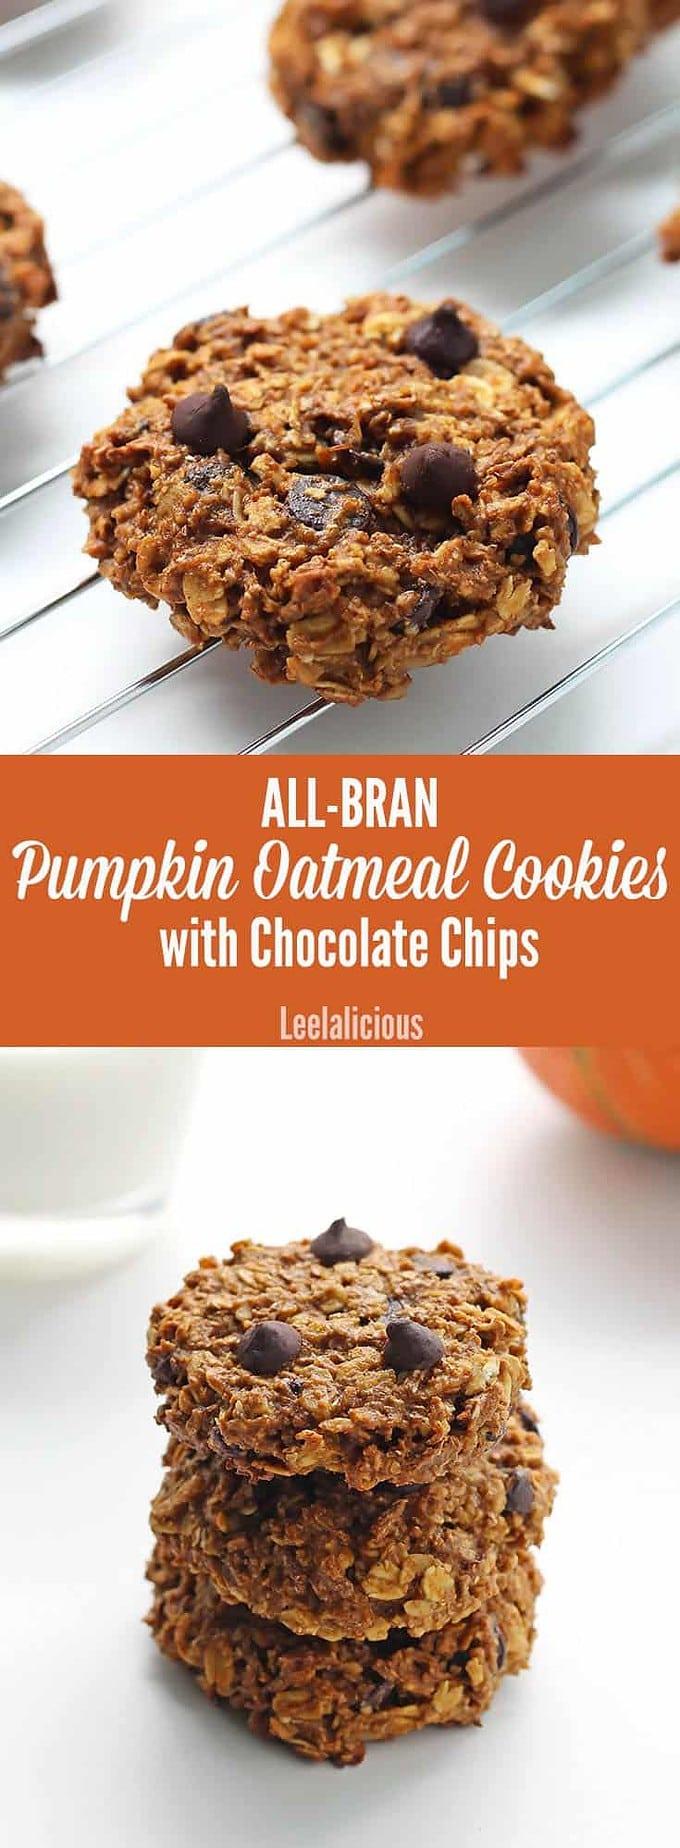 All-Bran Pumpkin Oatmeal Cookies